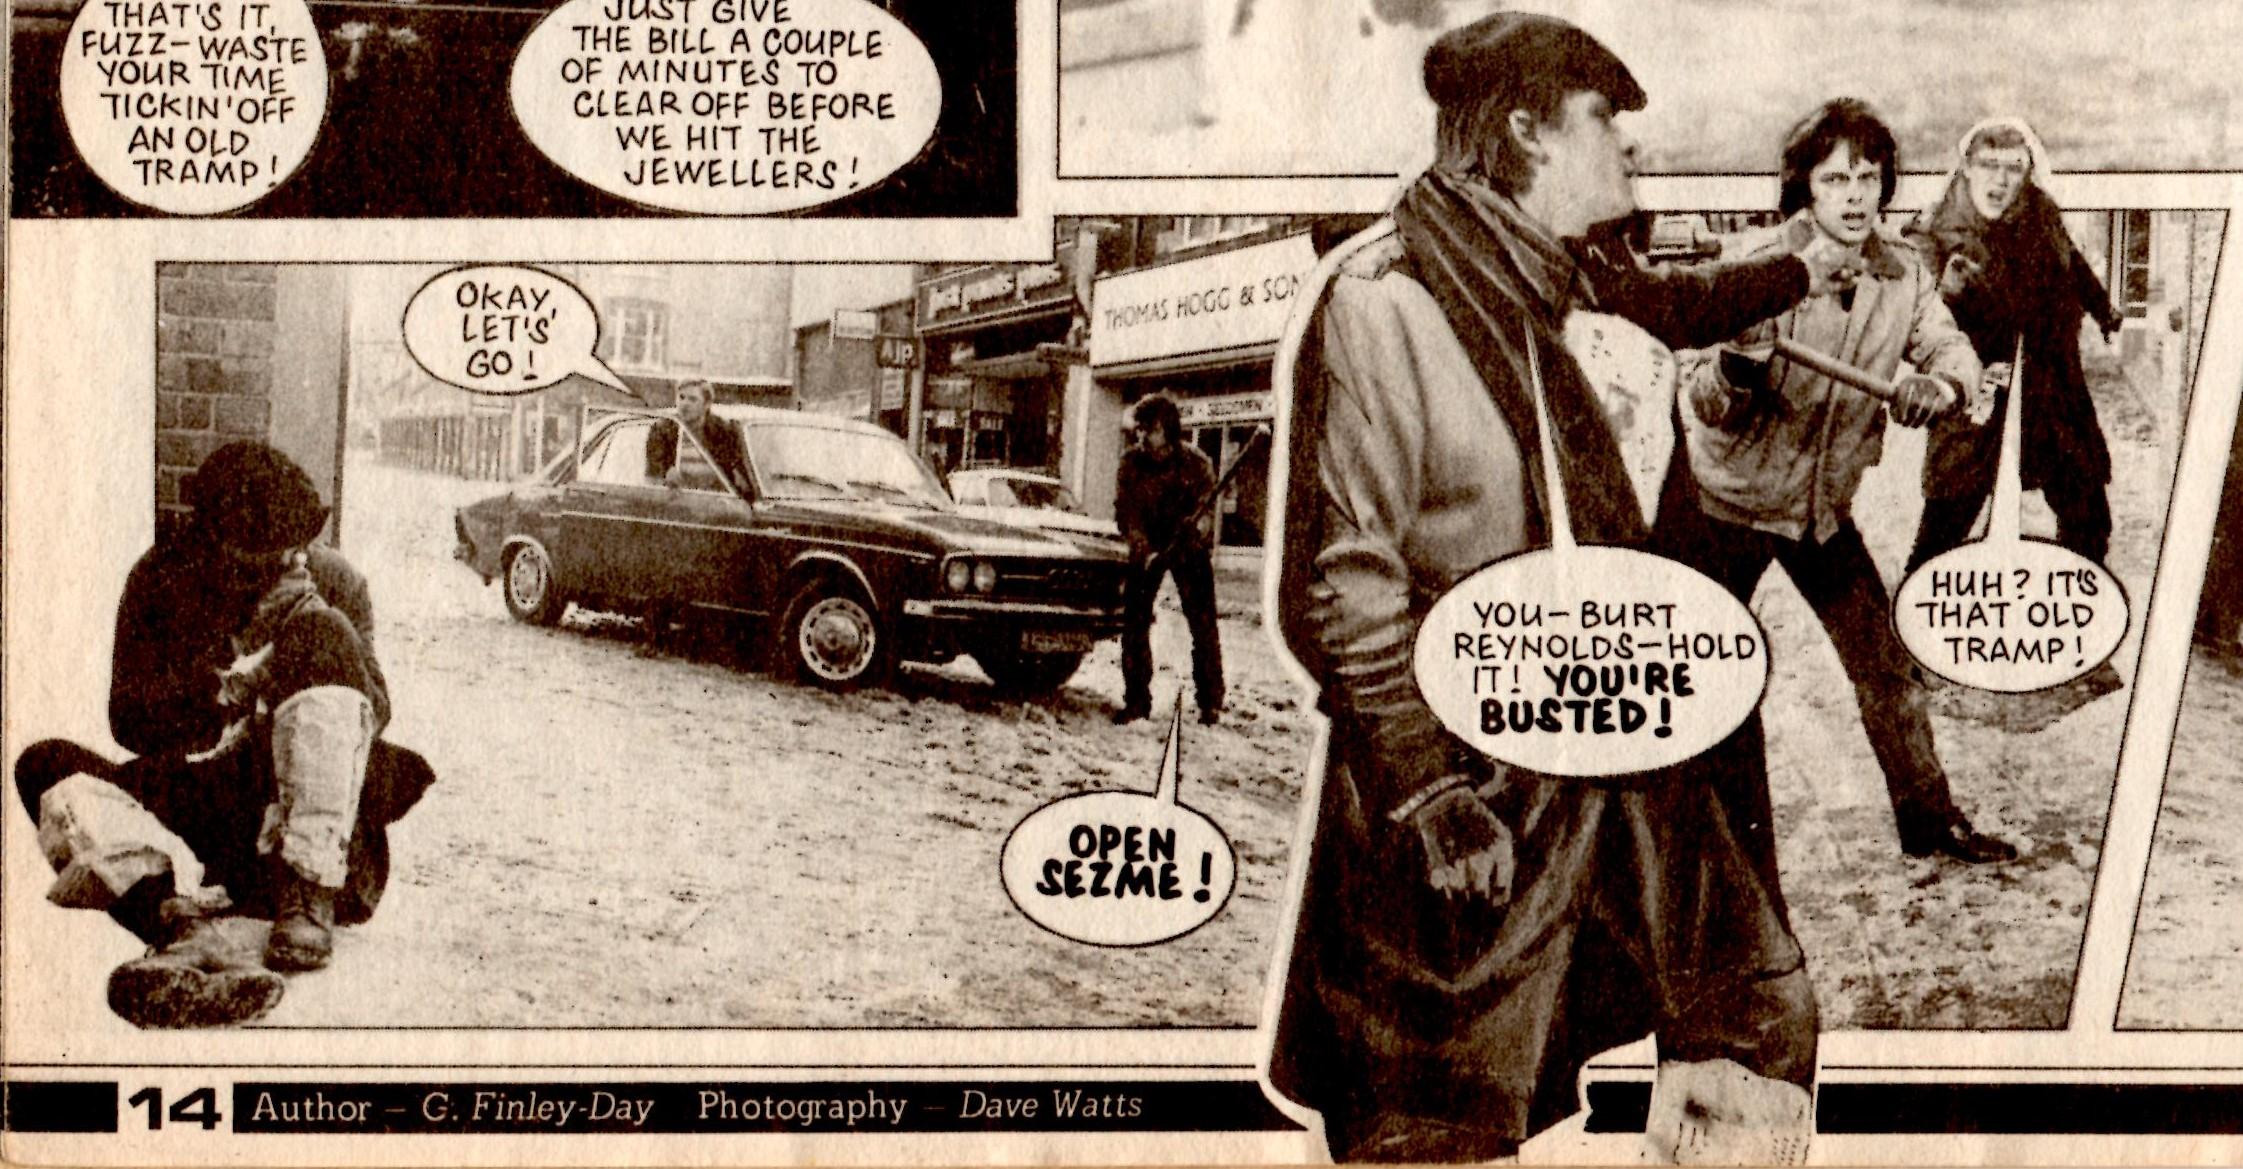 Sgt. Streetwise: Gerry Filnely-Day (writer), Dave Watts (artist)